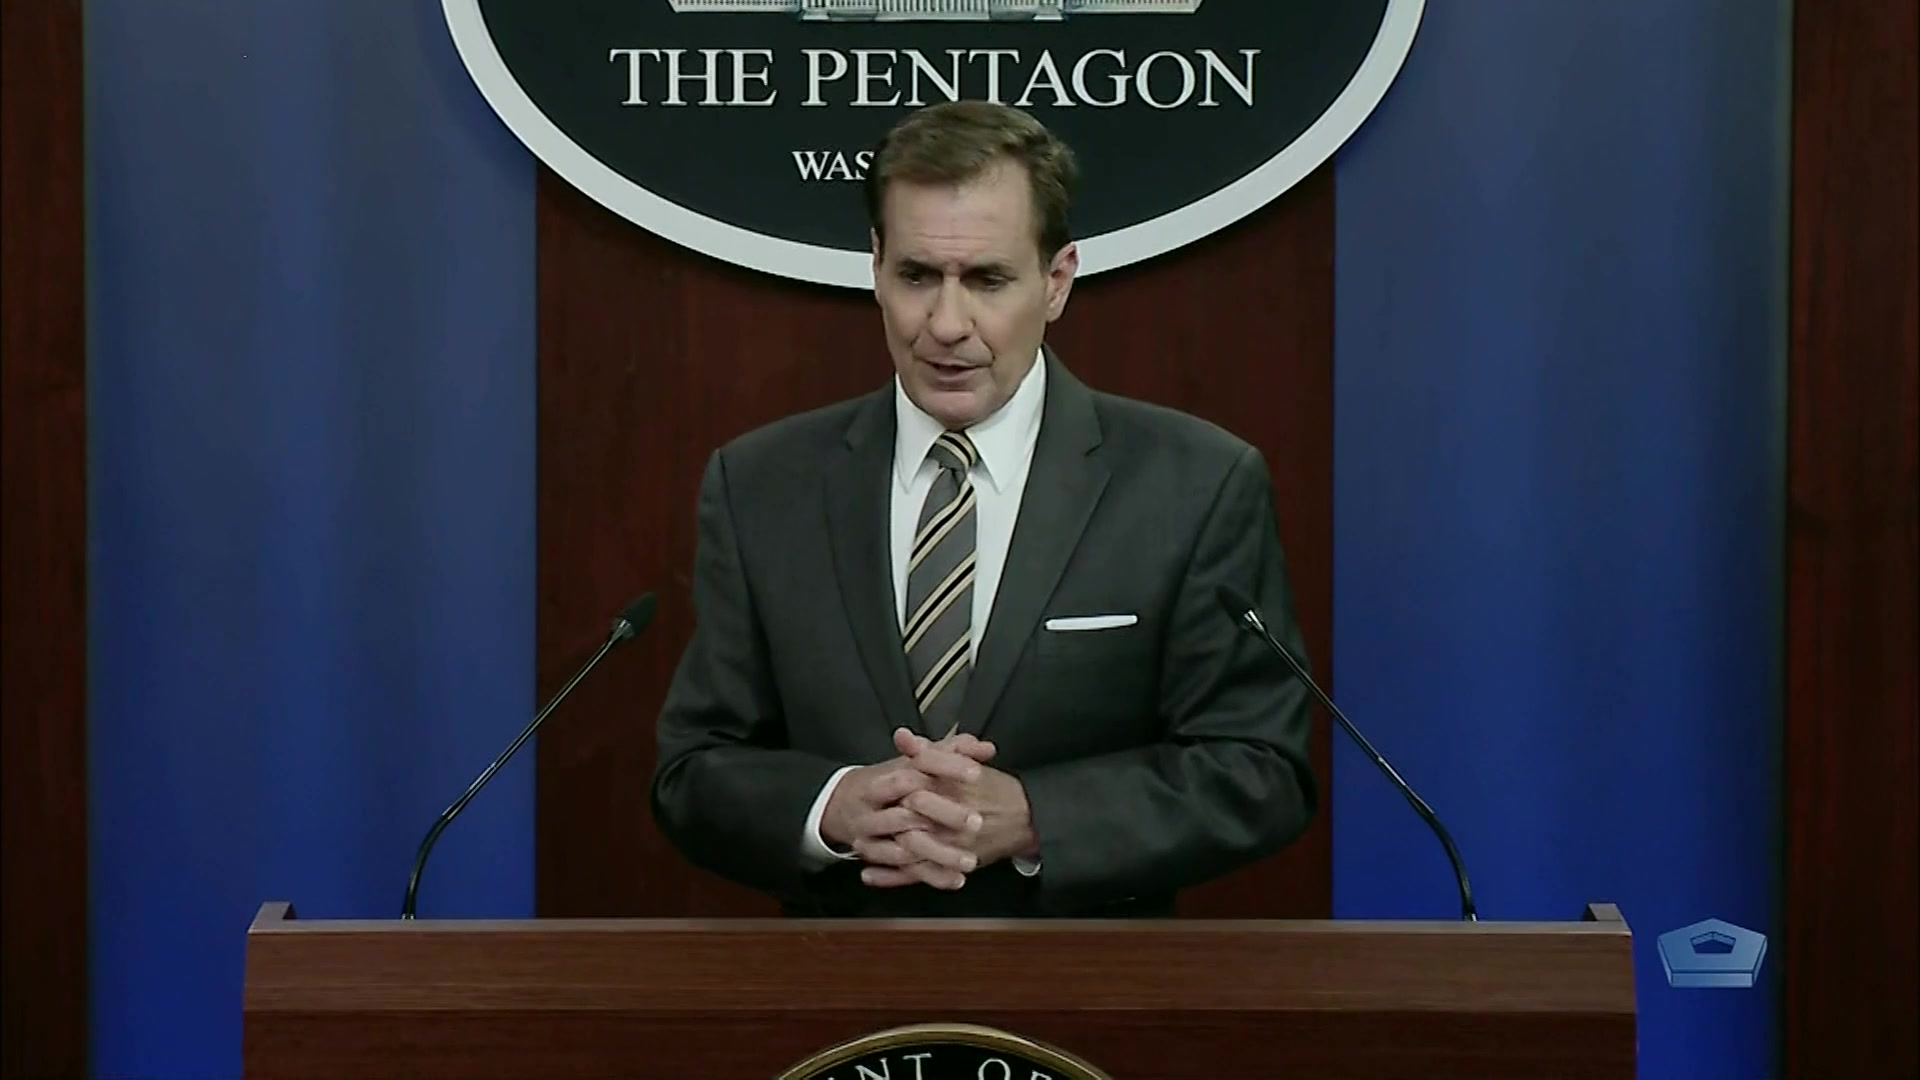 Pentagon press secretary speaks at a lectern.